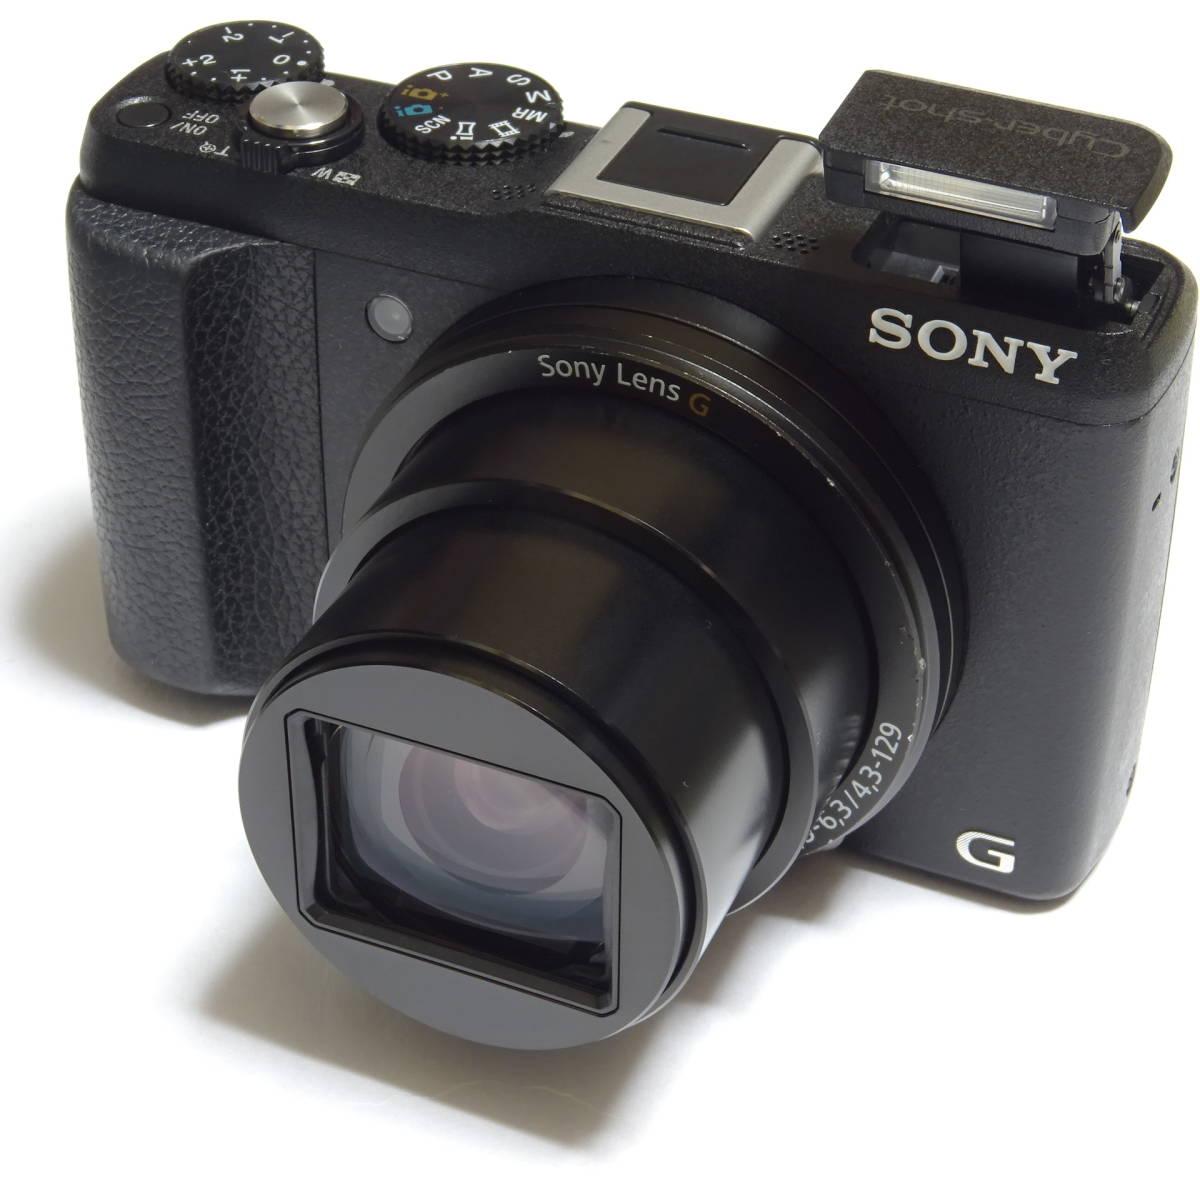 SONY Cyber-shot DSC-HX60V 2040万画素 光学30倍 Full HD 1080 60p 動画撮影 GPS Wi-Fi NFC 中古本体・箱・取説付き ☆動作品☆ 0899